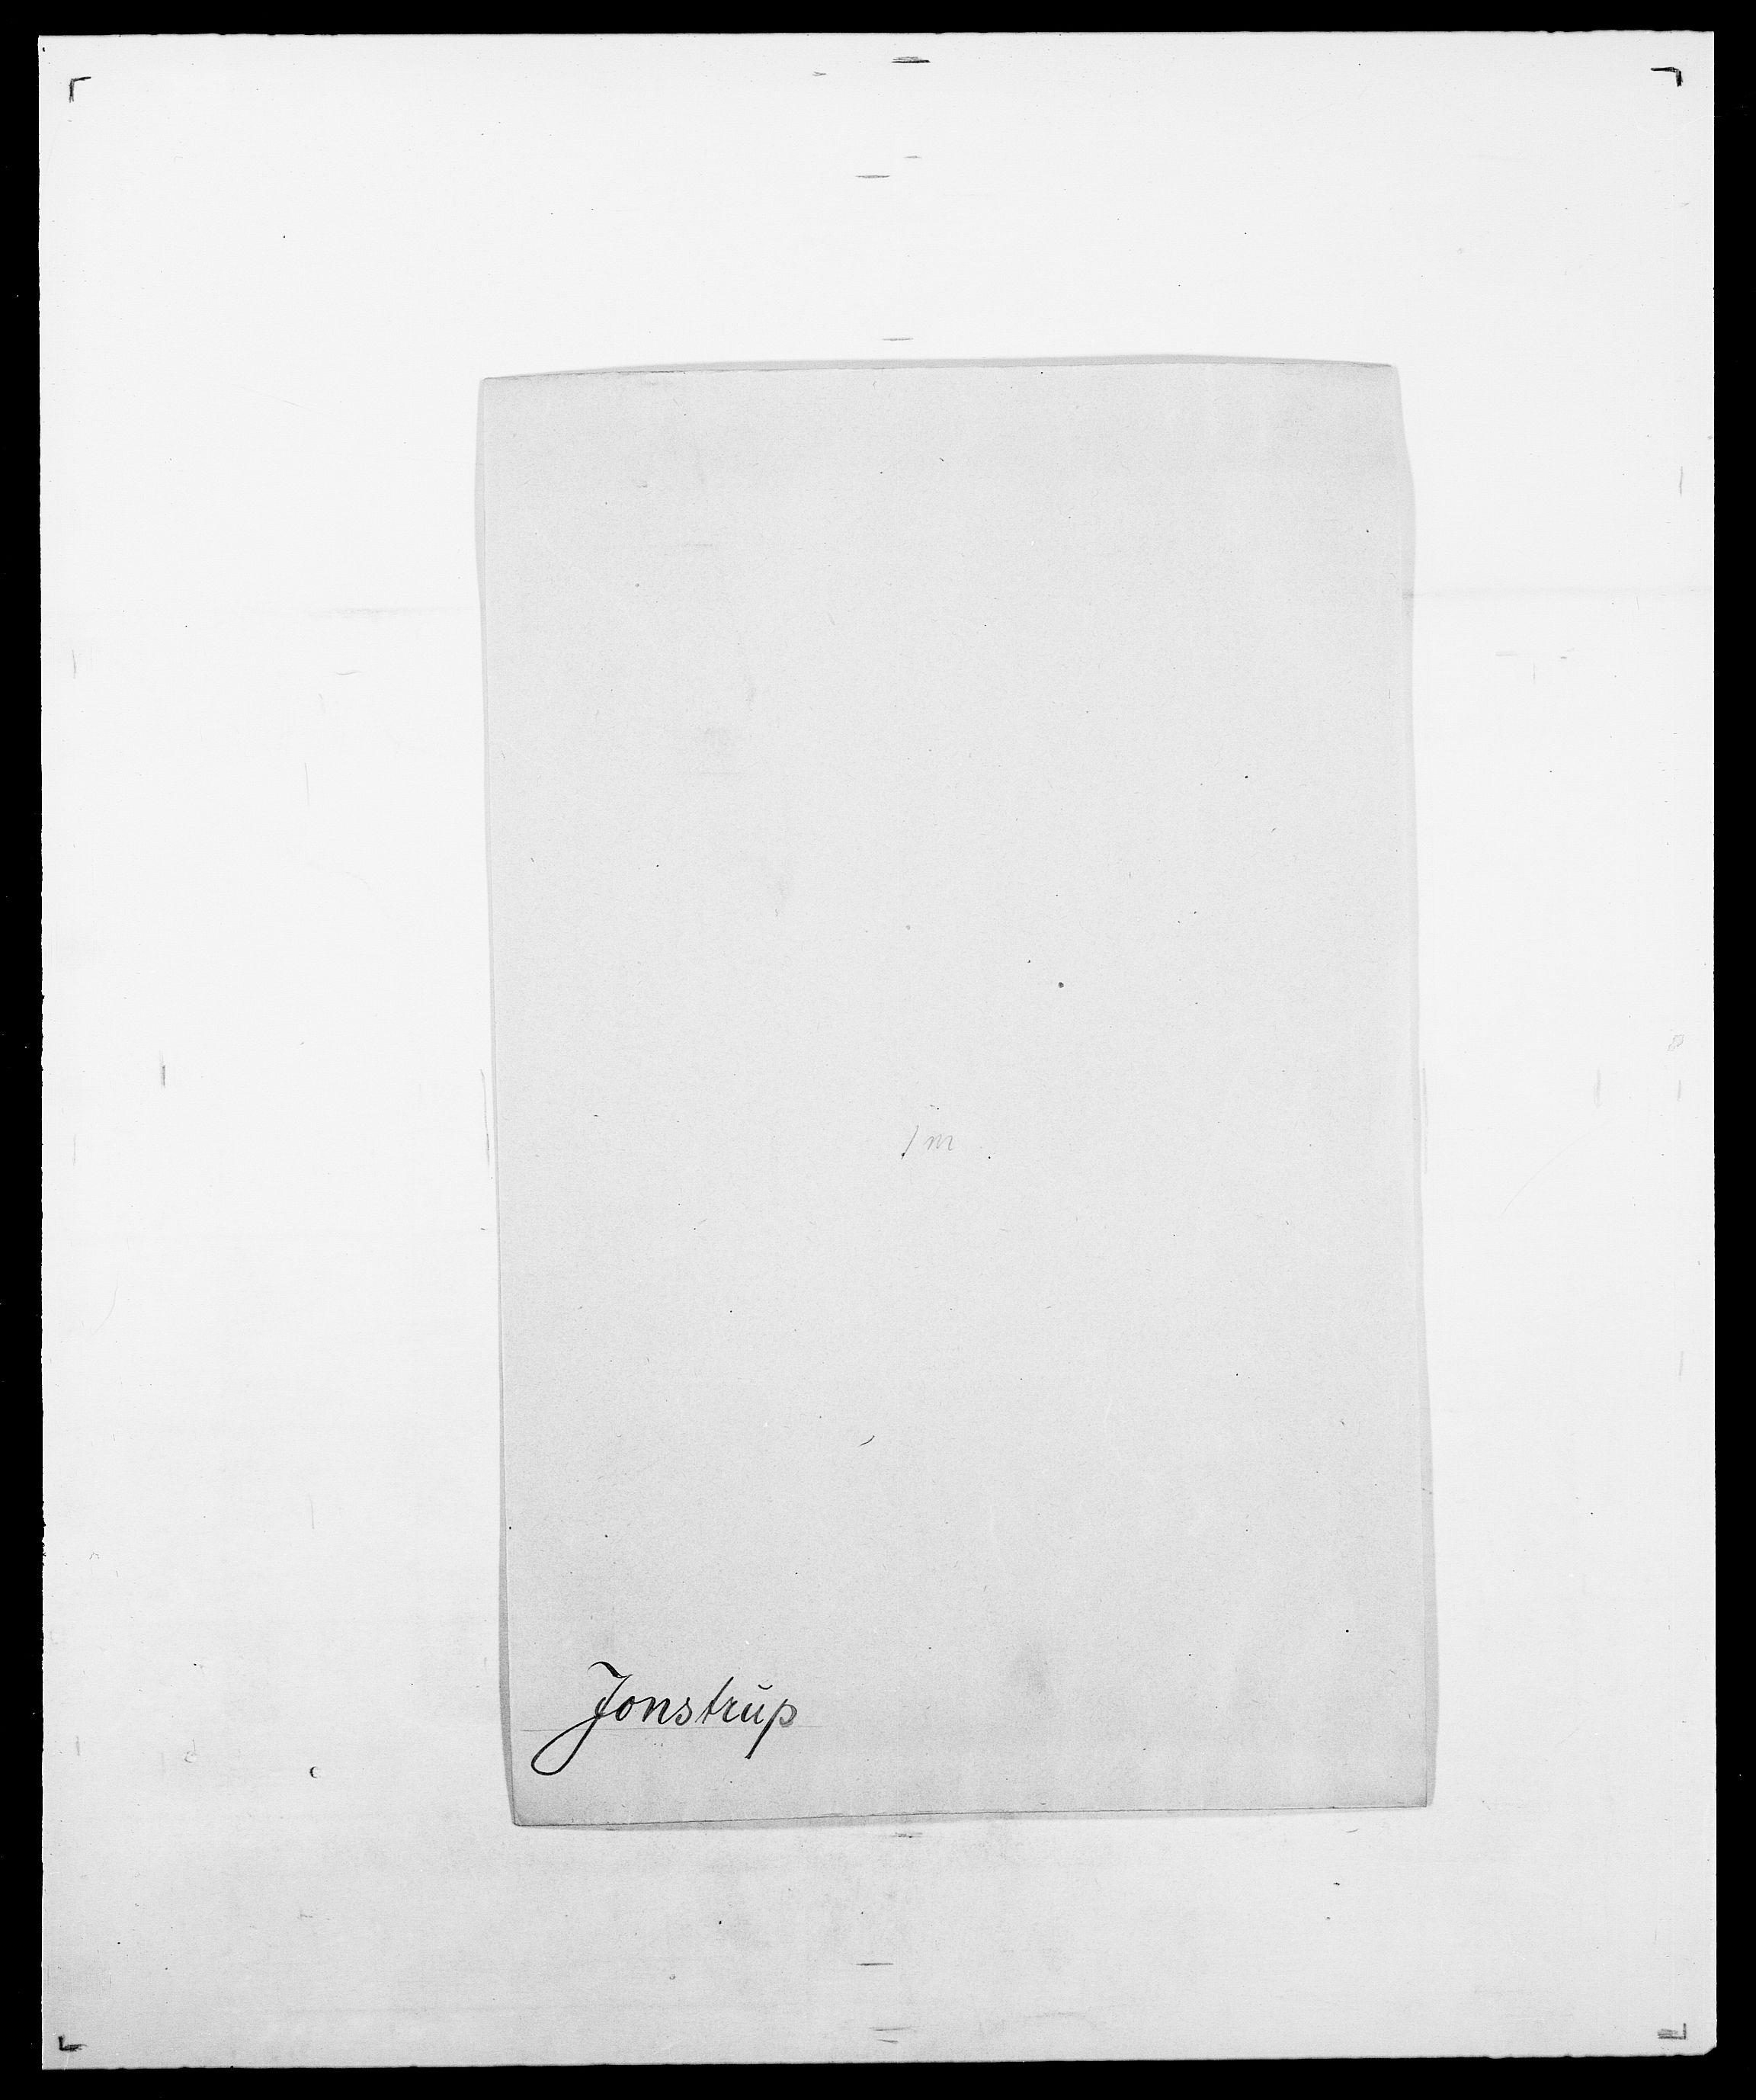 SAO, Delgobe, Charles Antoine - samling, D/Da/L0019: van der Hude - Joys, s. 885